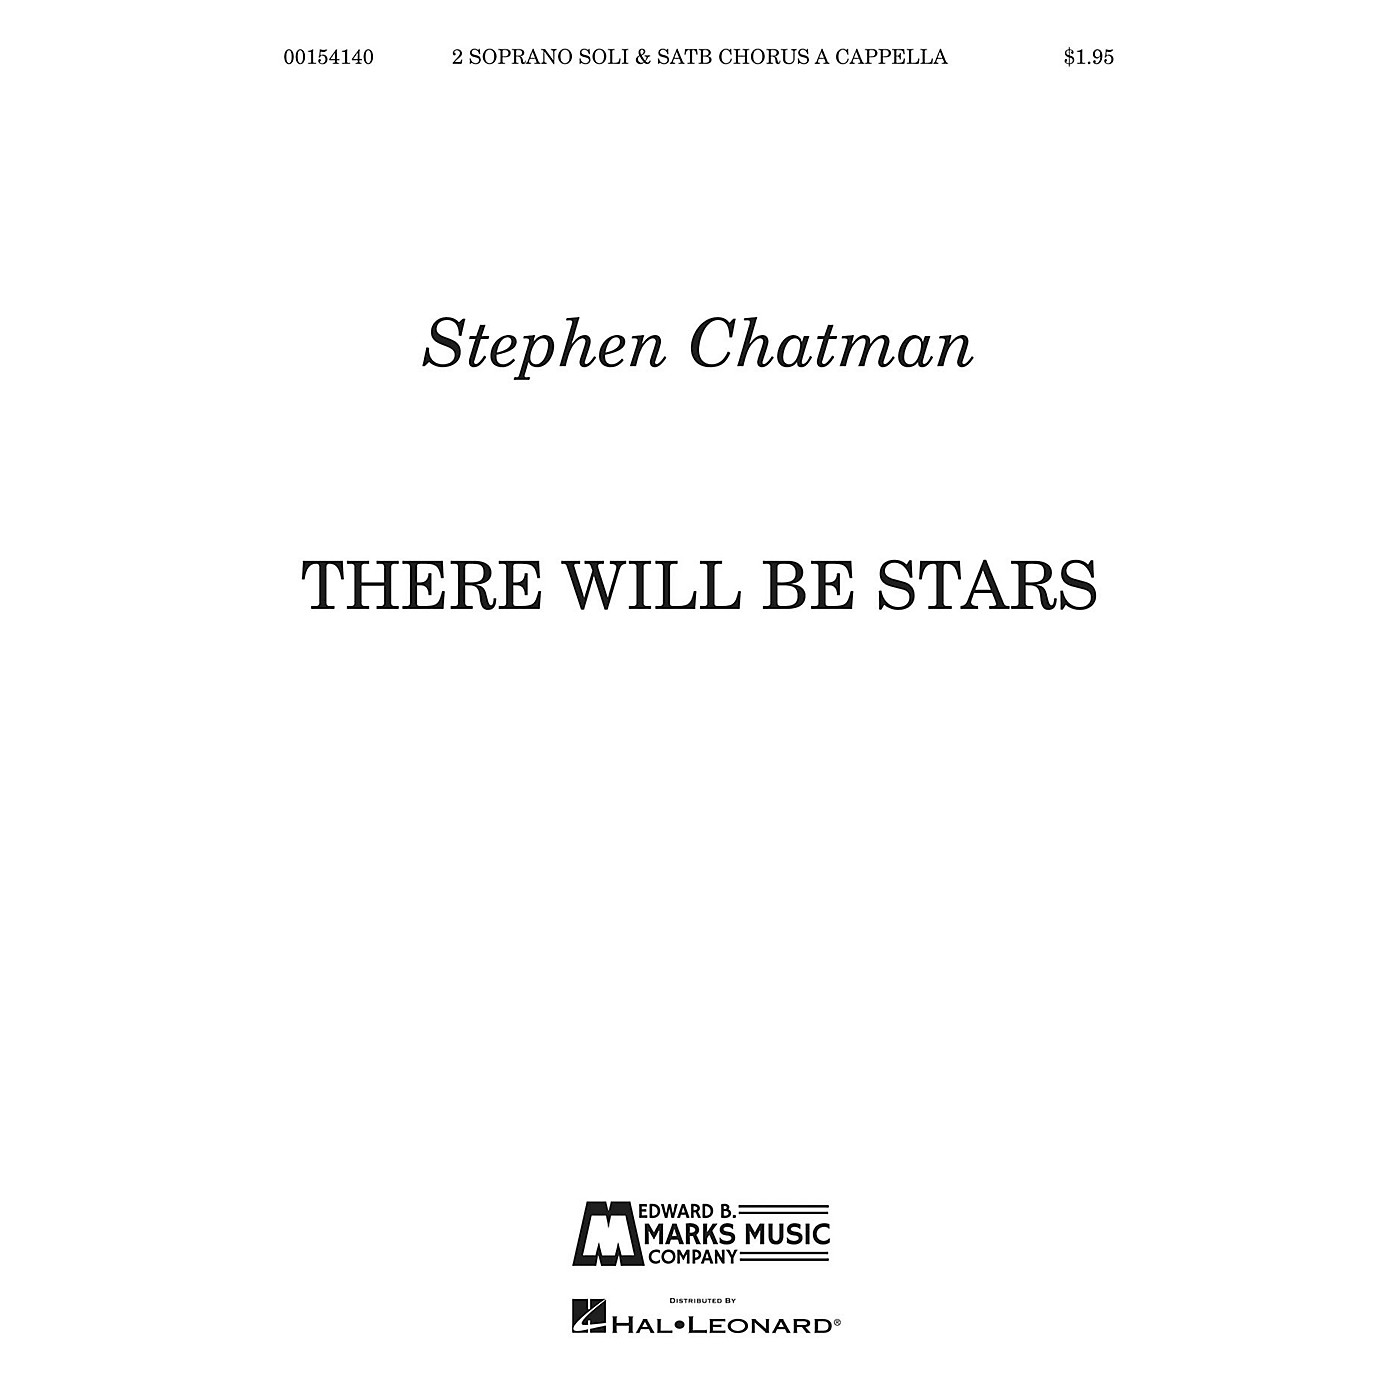 Edward B. Marks Music Company There Will Be Stars (for 2 Soprano soli and SATB Chorus a cappella) SATB a cappella by Stephen Chatman thumbnail